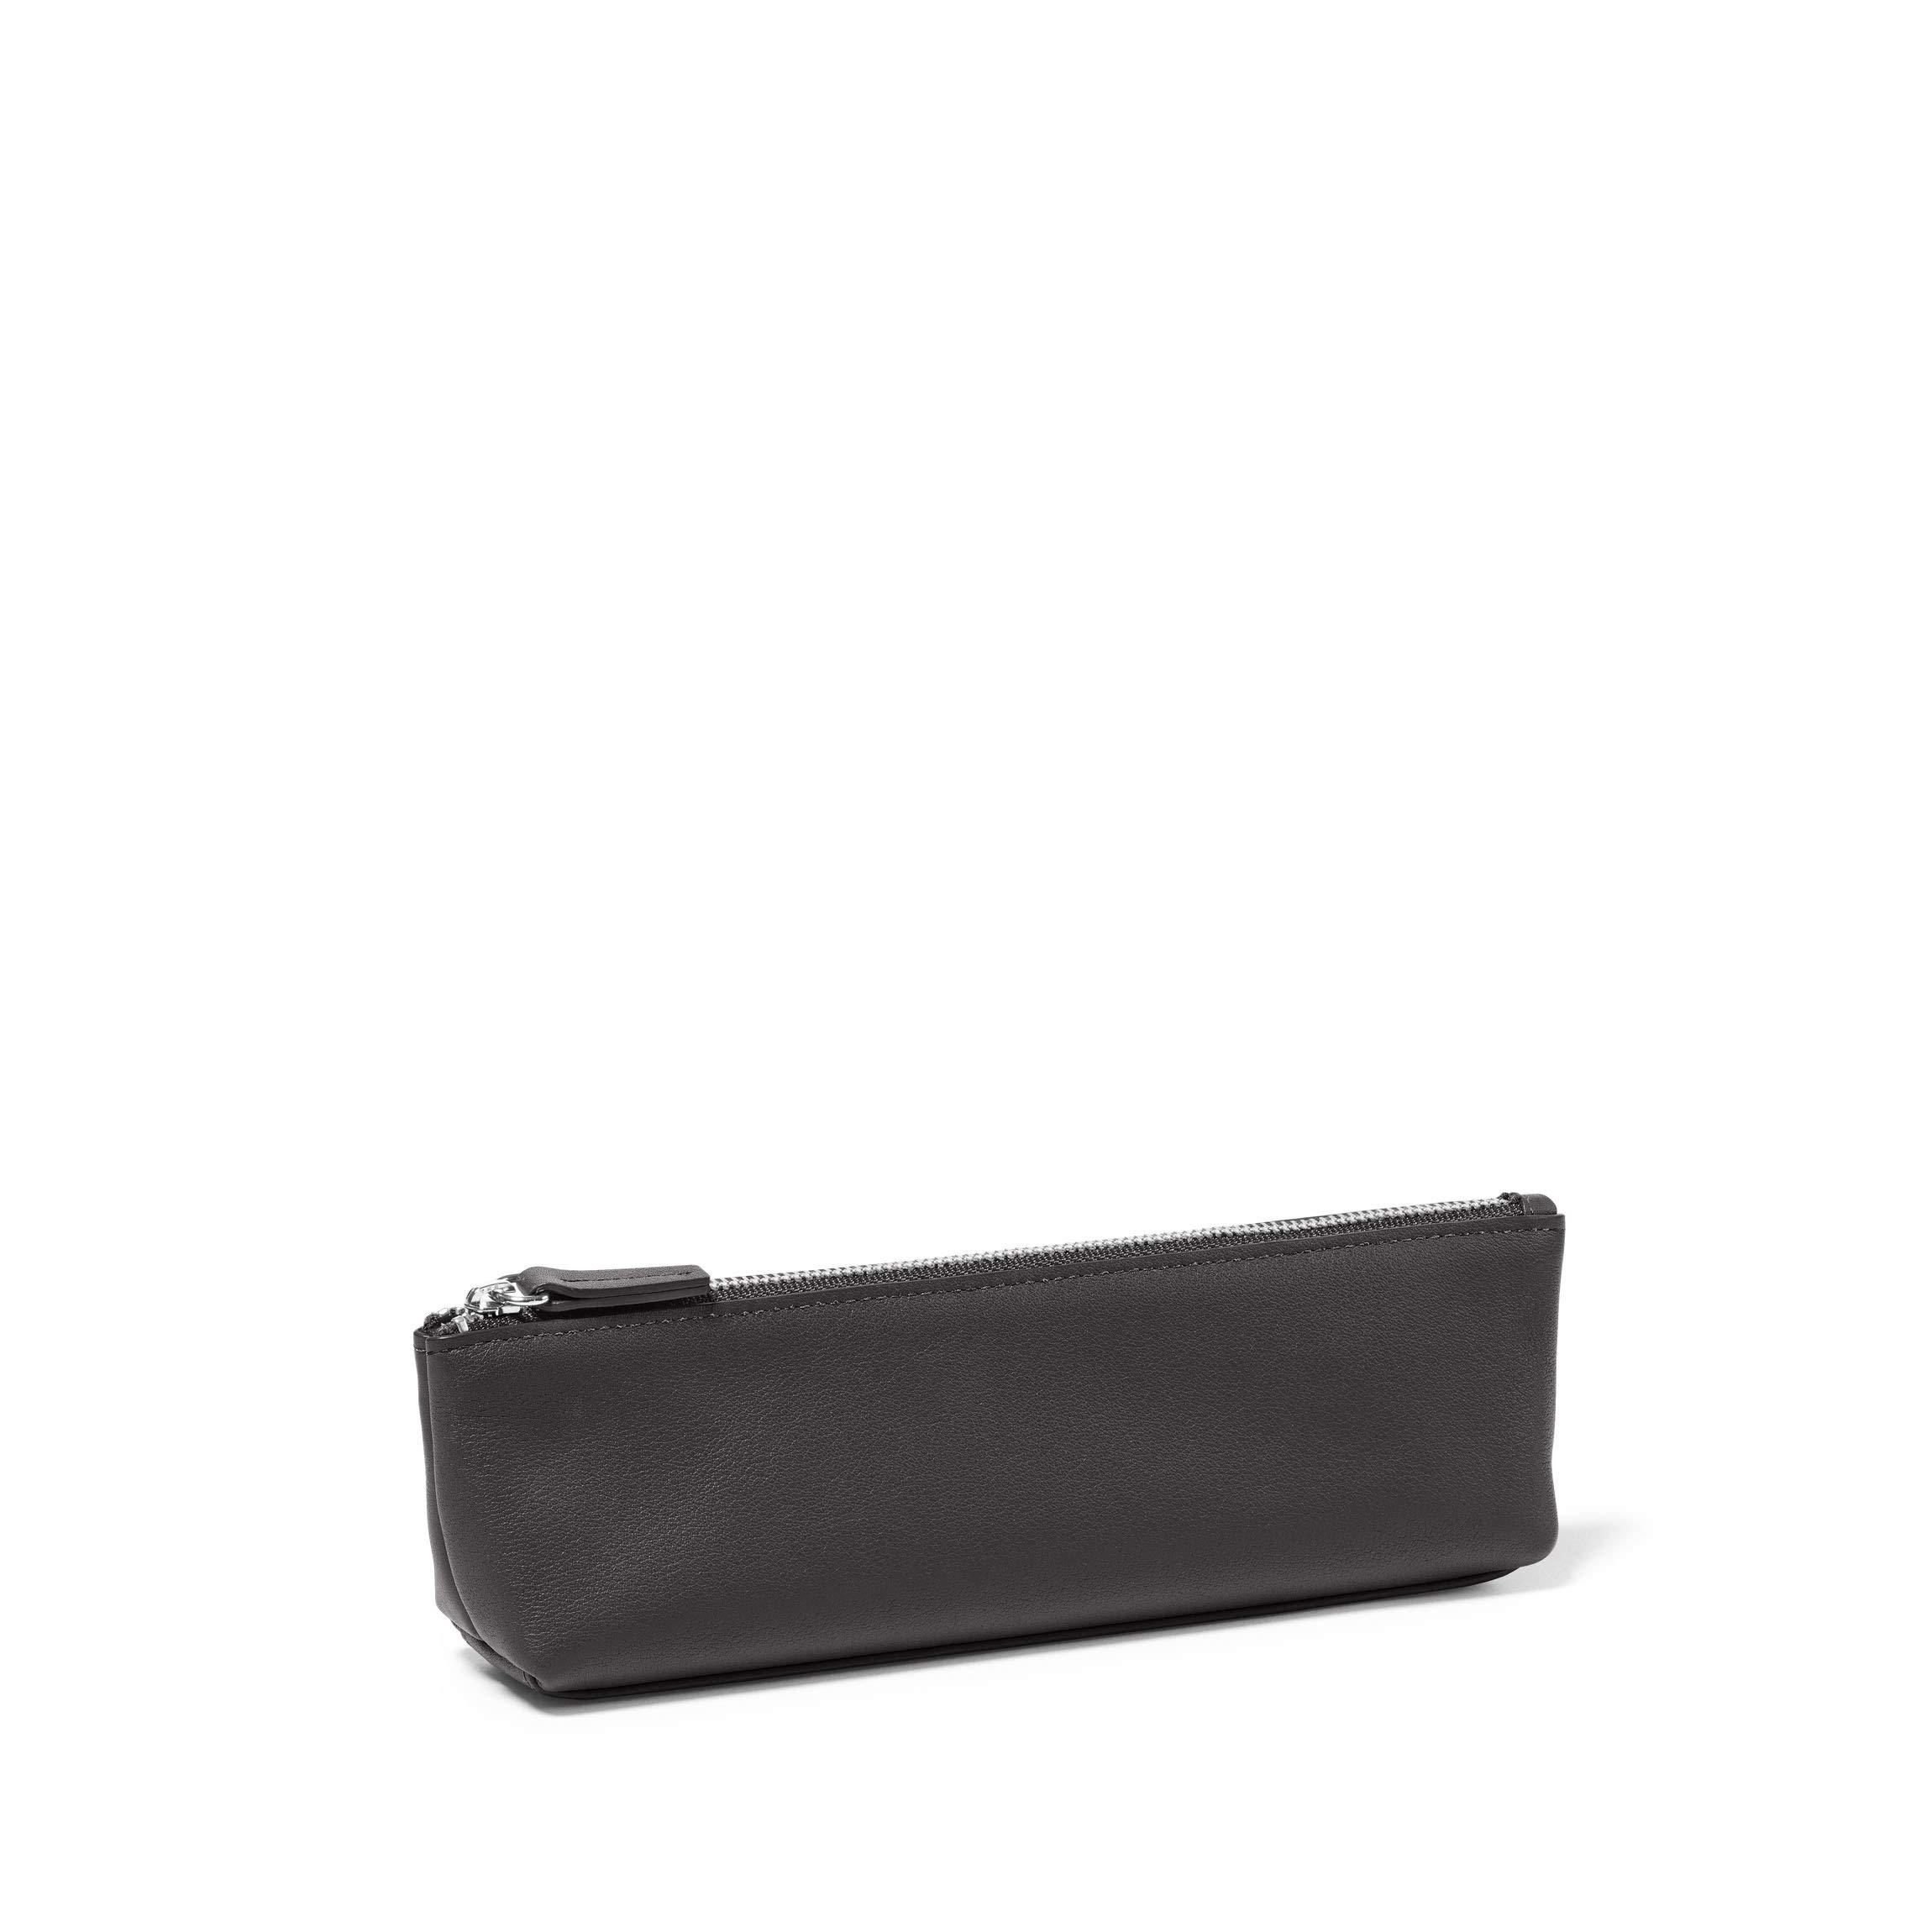 Pencil Case - Full Grain Leather Leather - Black Onyx (Black)